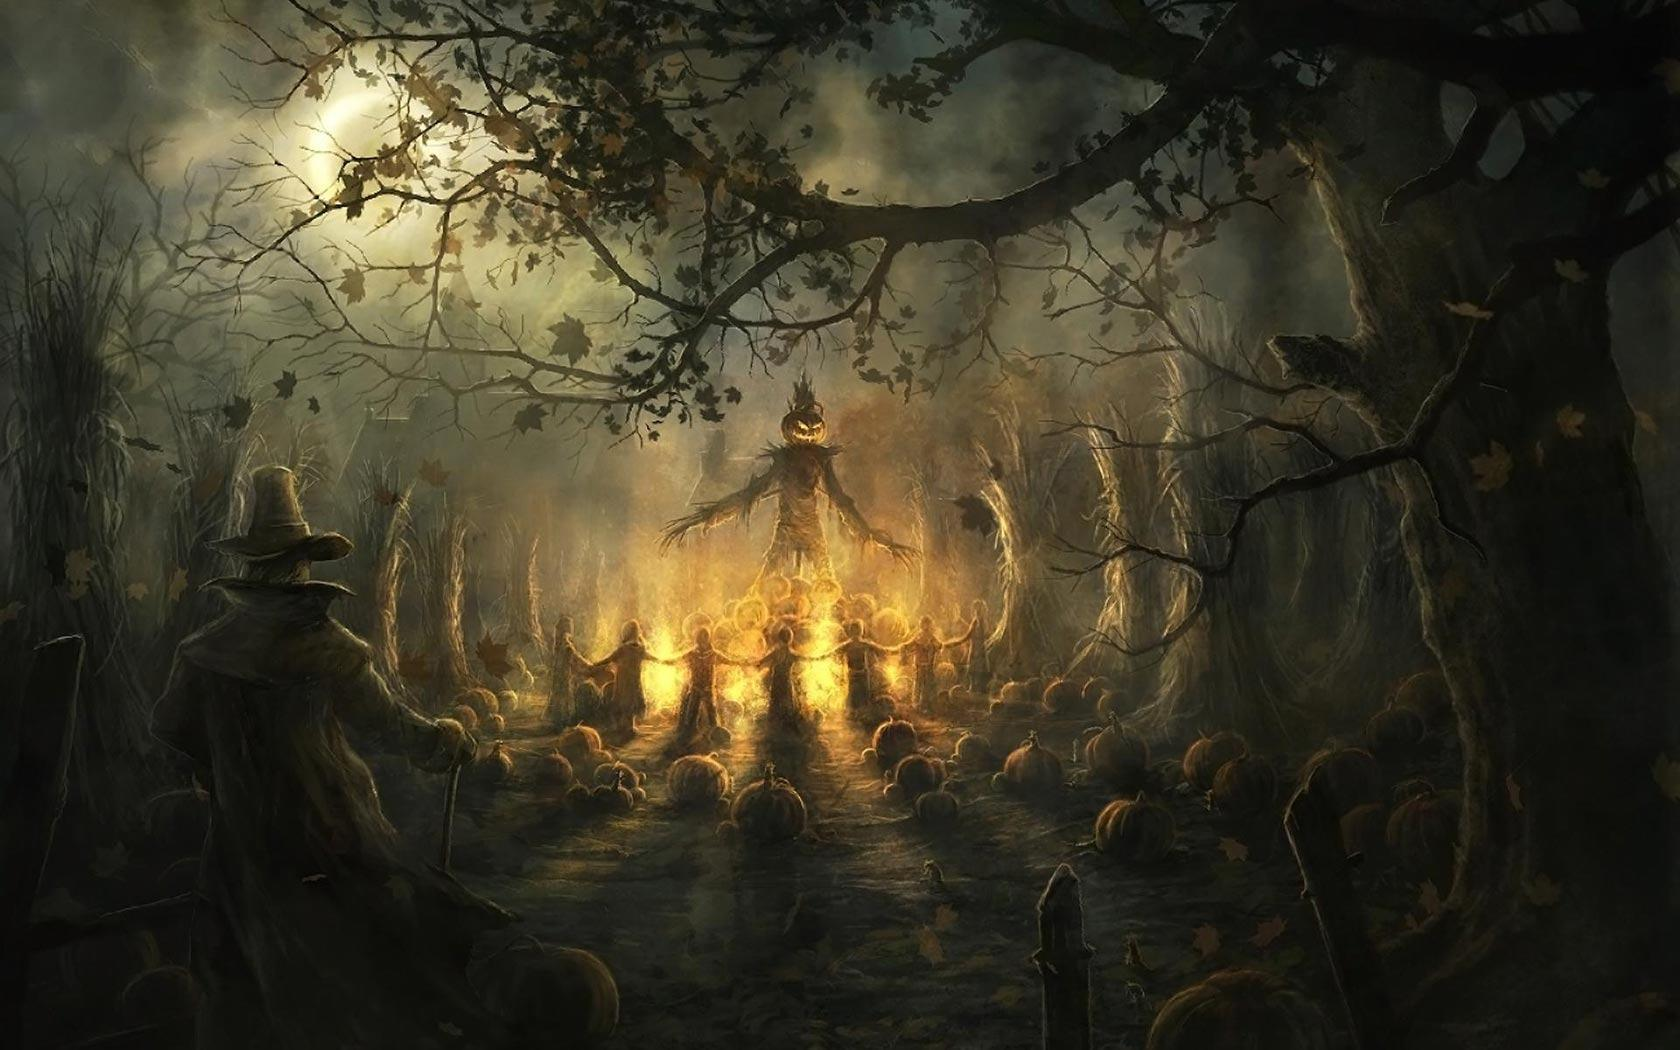 Halloween Haunted House Wallpaper 2